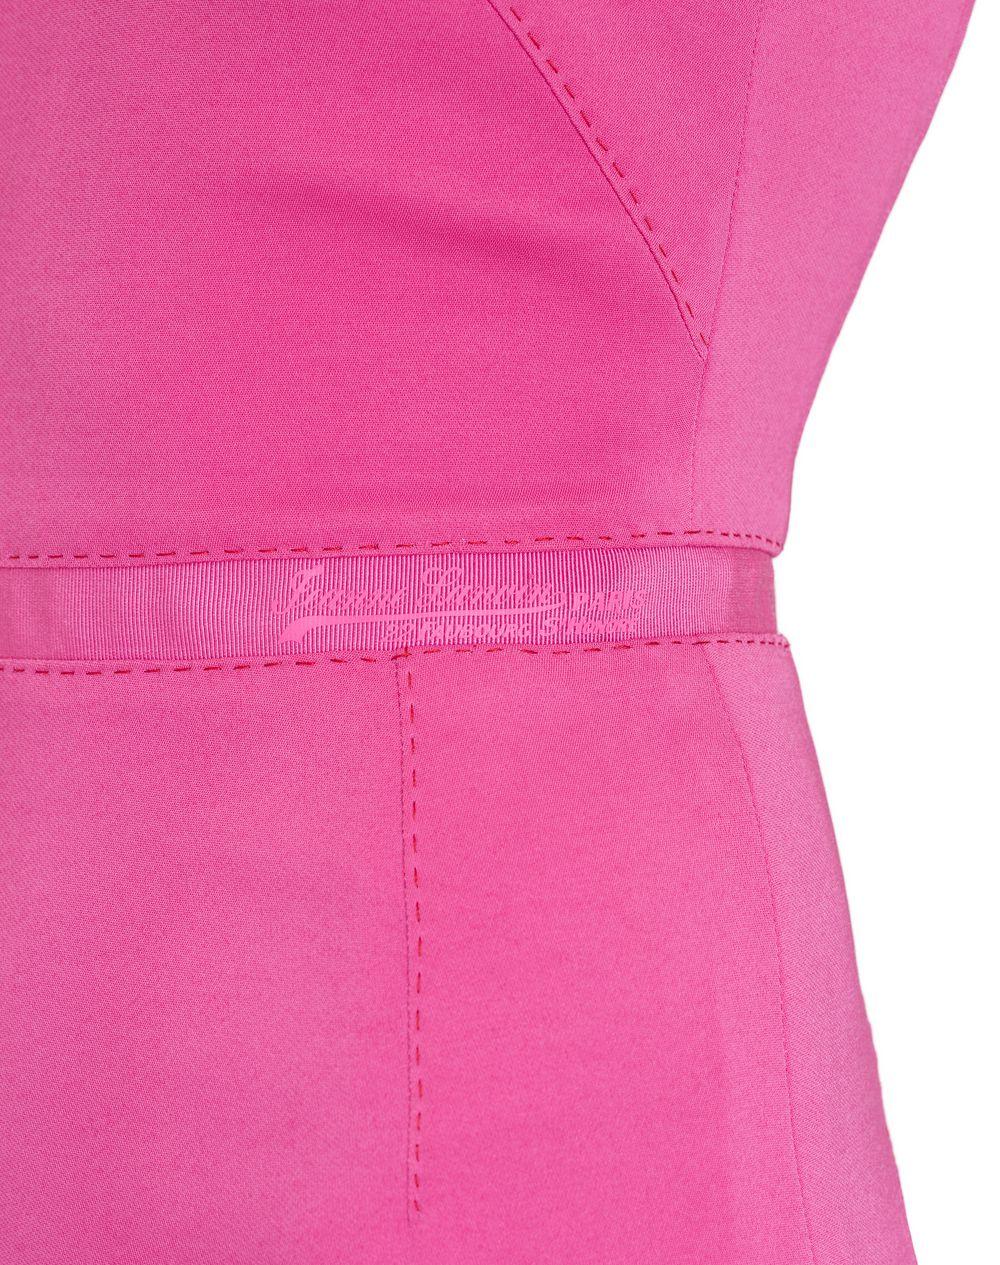 PINK MID-LENGTH DRESS  - Lanvin